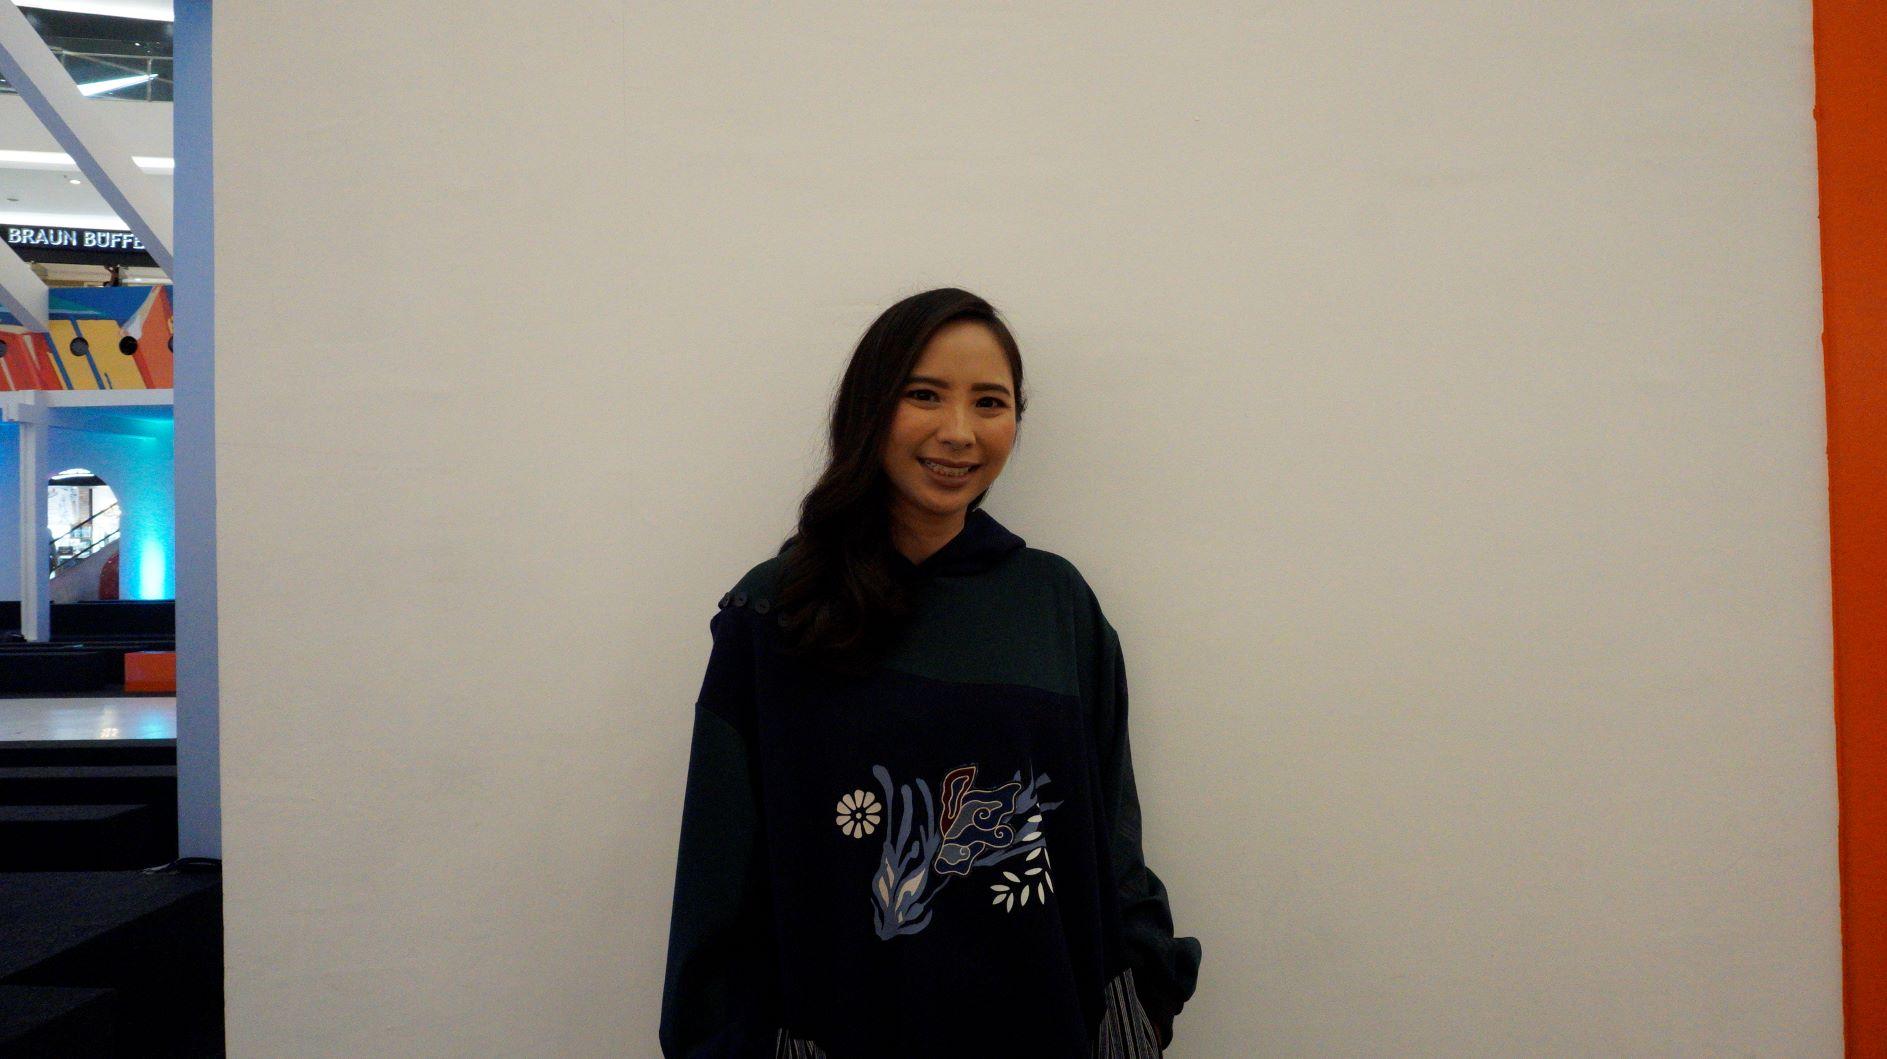 Michelle Tjokrosaputro Berdayakan Pengrajin Batik Klaten Dalam Koleksi Bateeq Arung